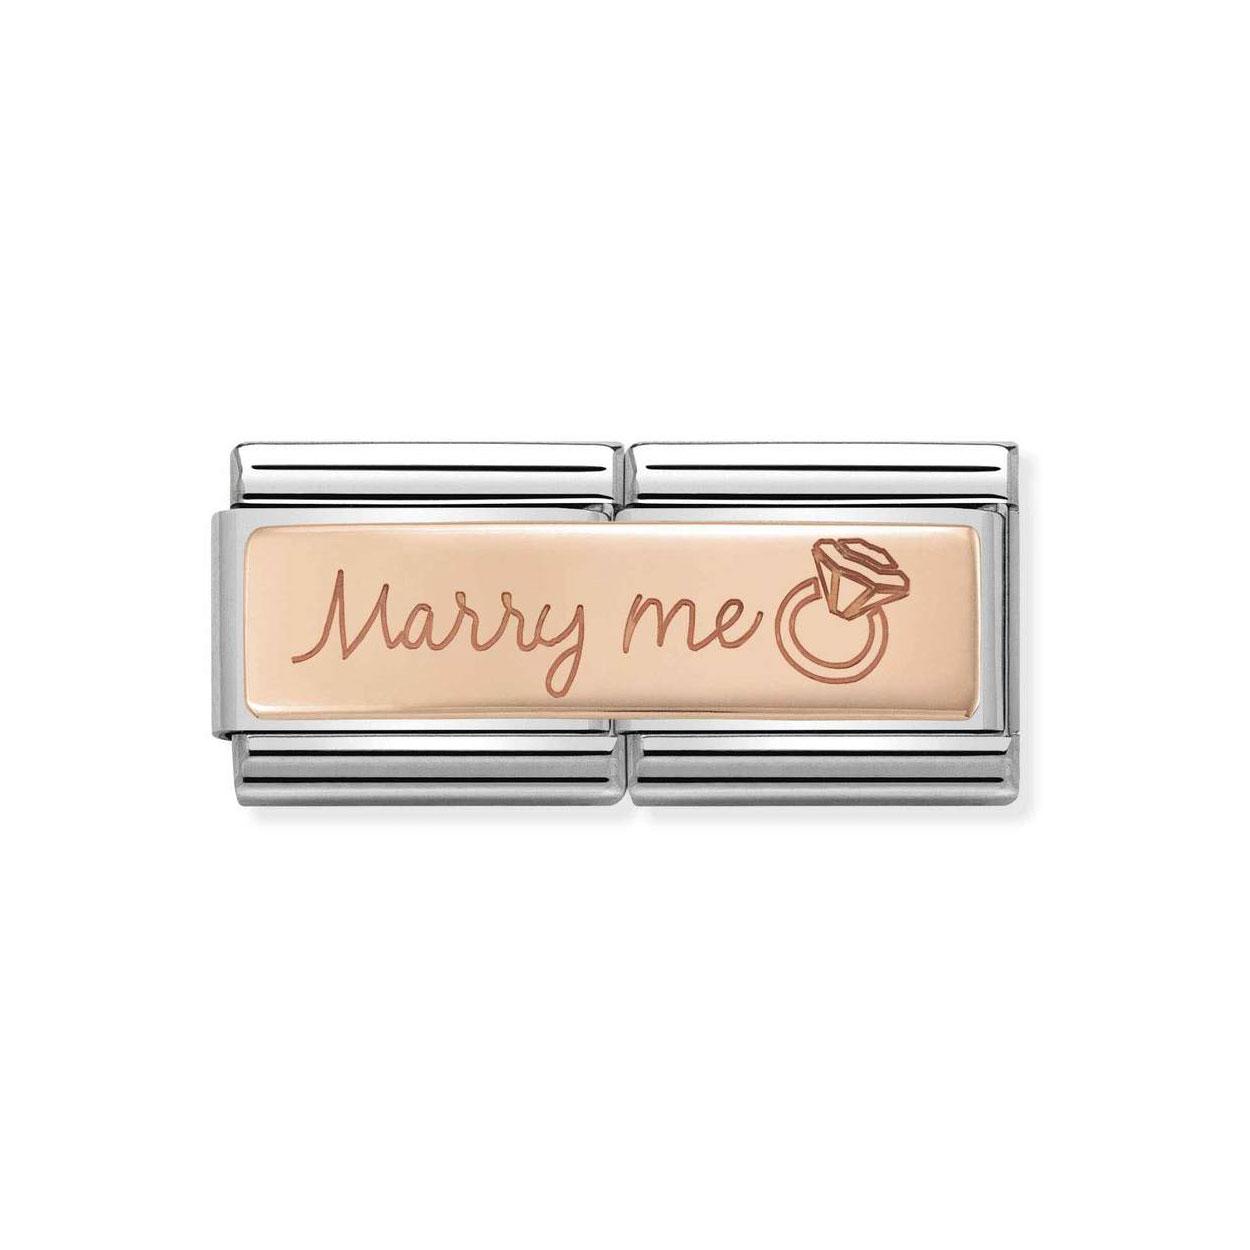 65b131519863 Nomination Classic Marry Me Italian Charm  Precious Accents